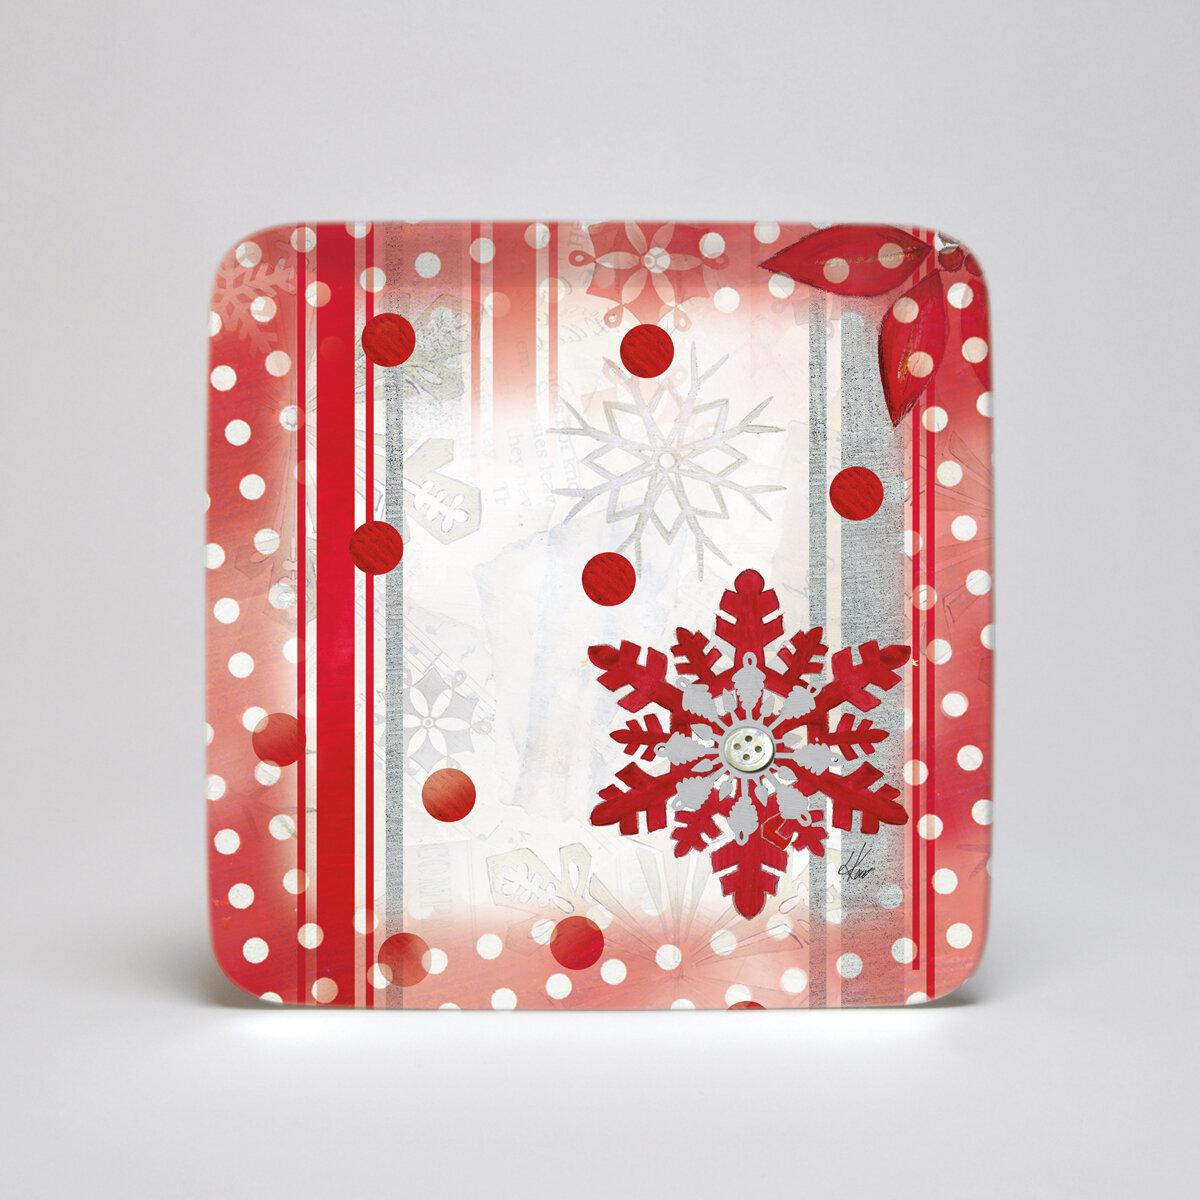 & Lang Winter Holiday Melamine Square 10.5